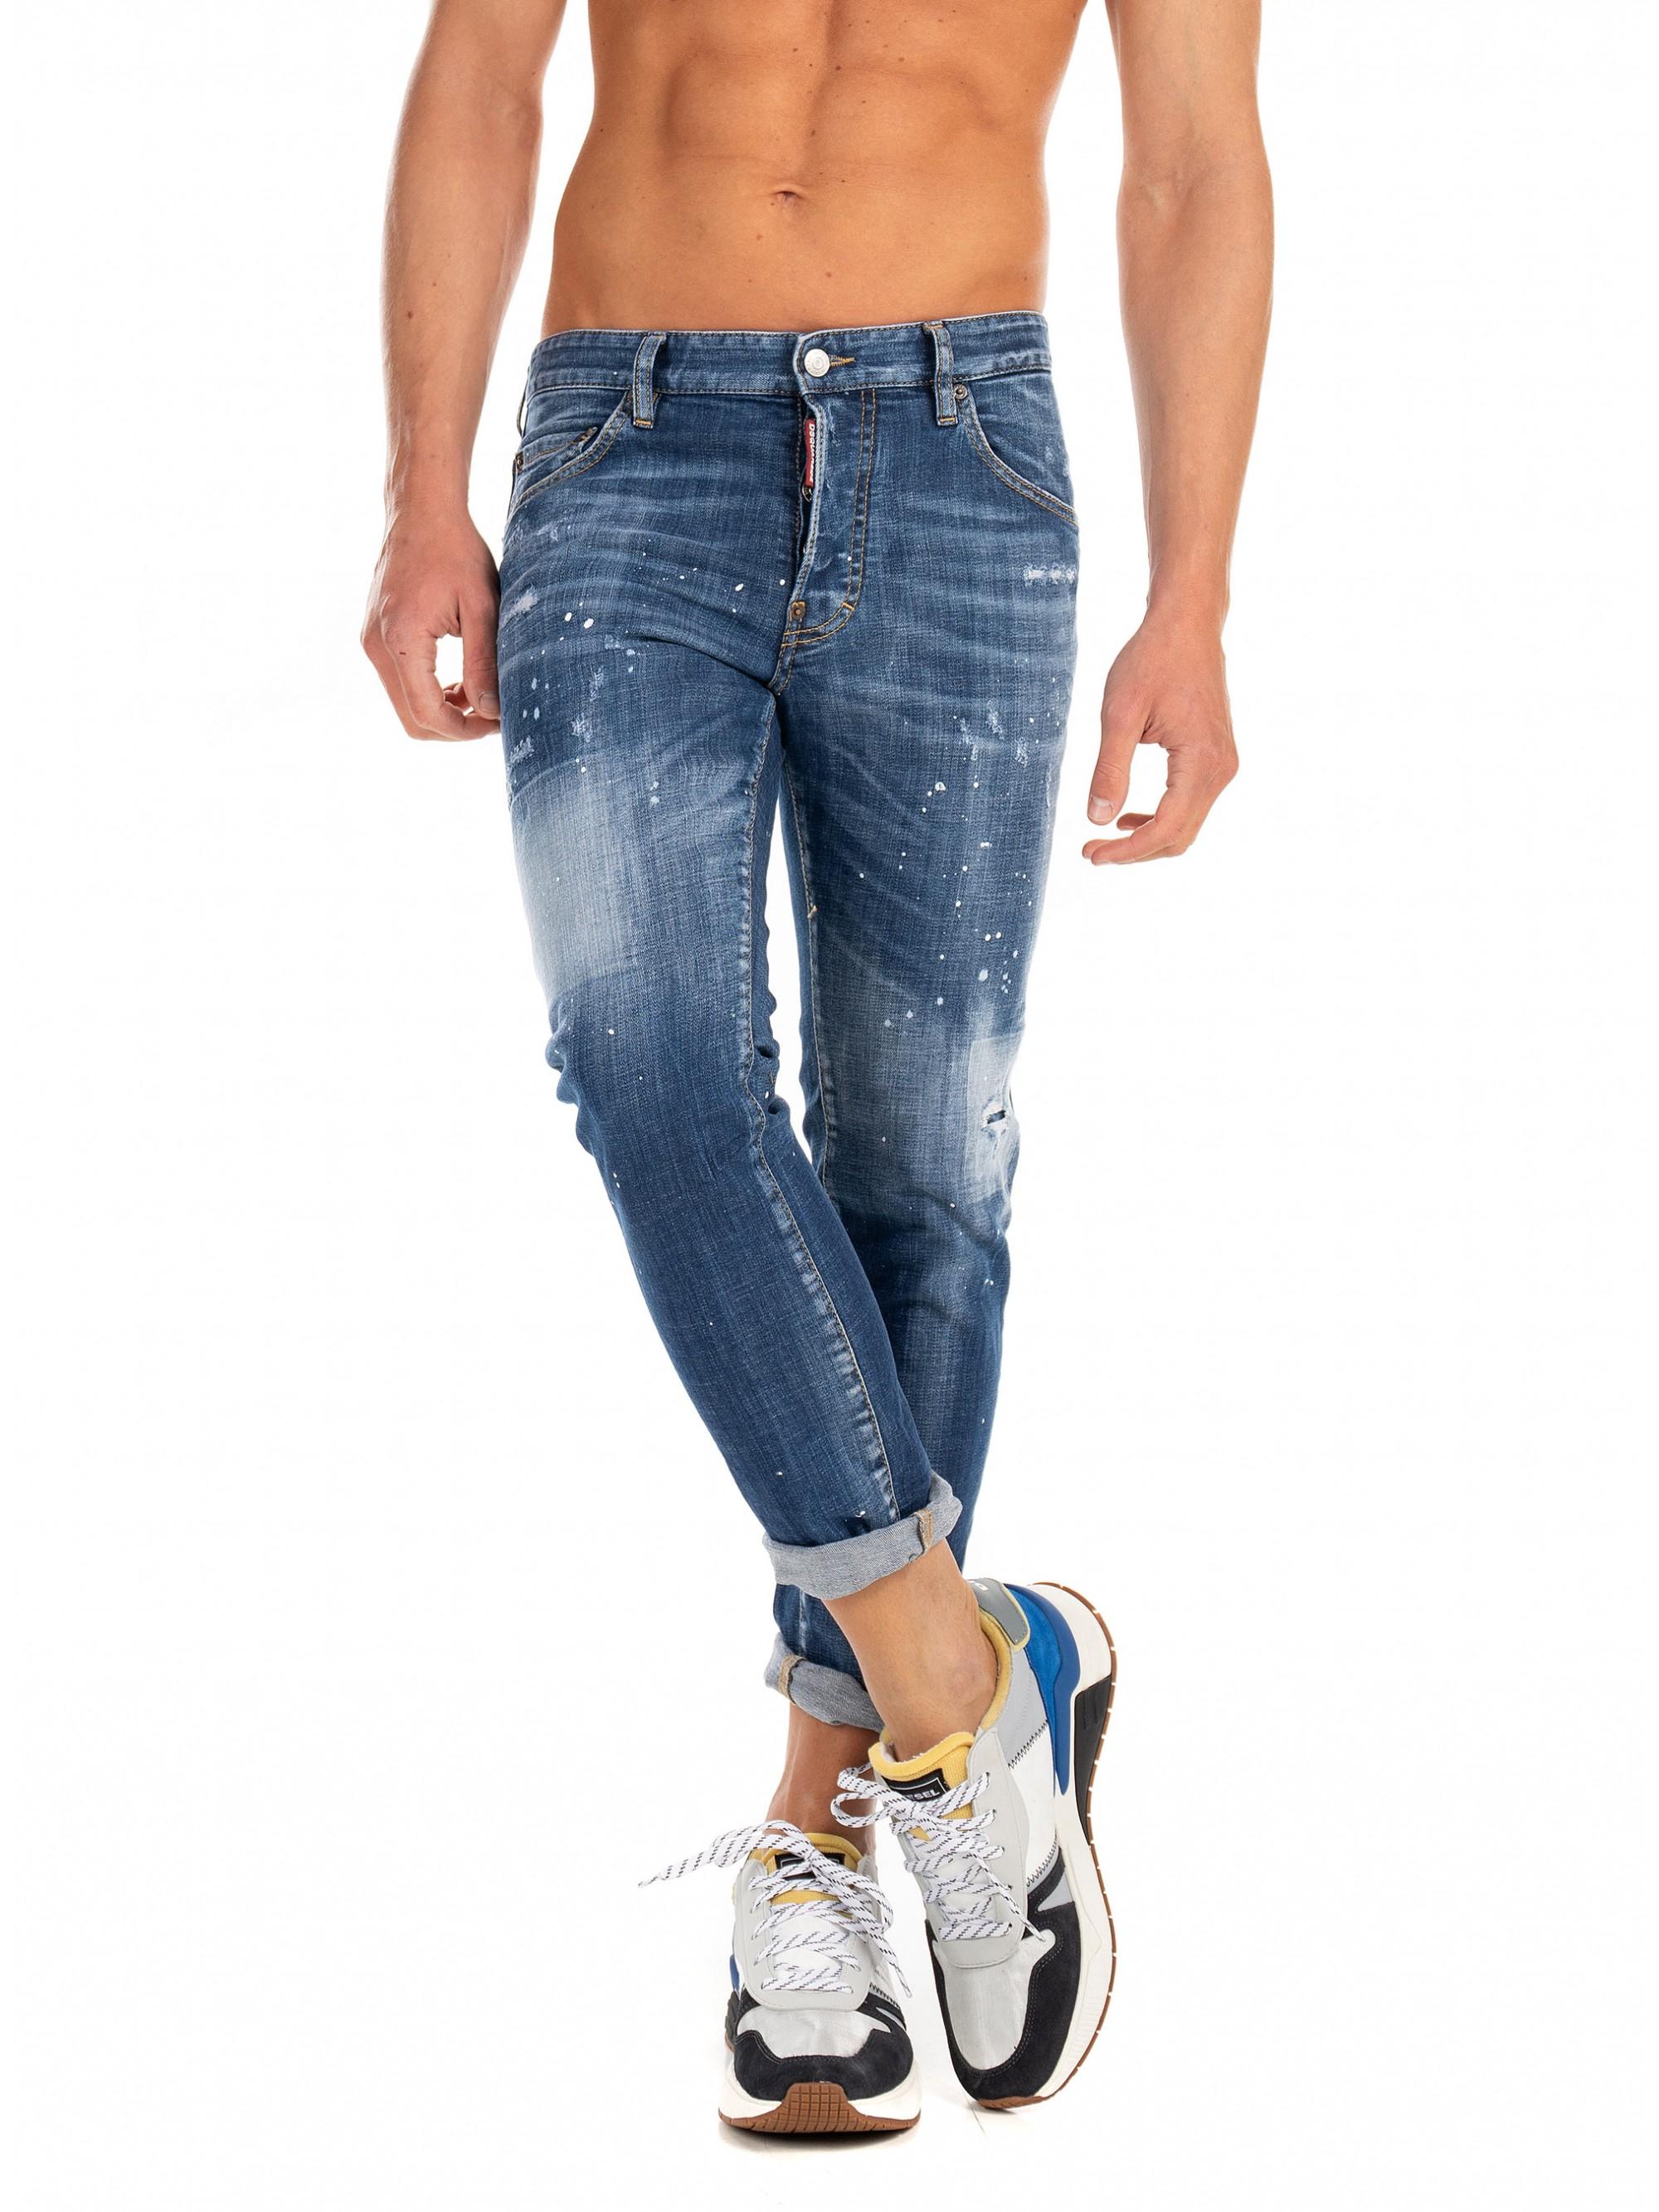 Open crotch lingerie | Etsy